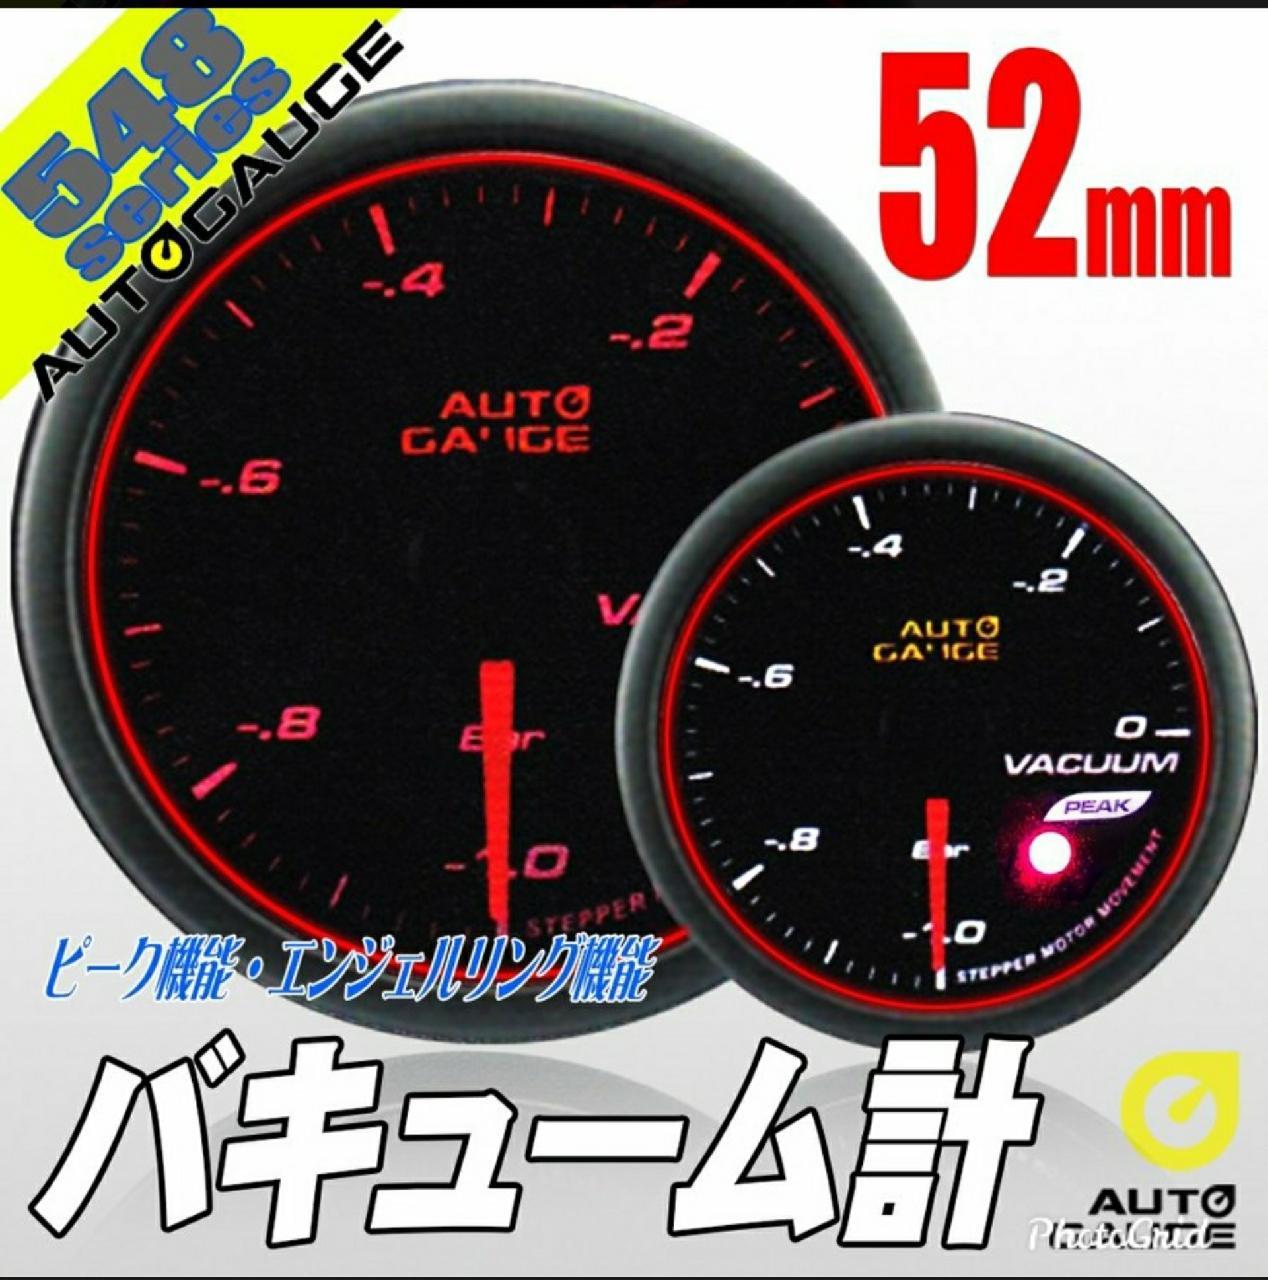 AutoGauge 548シリーズ バキューム計 52φ